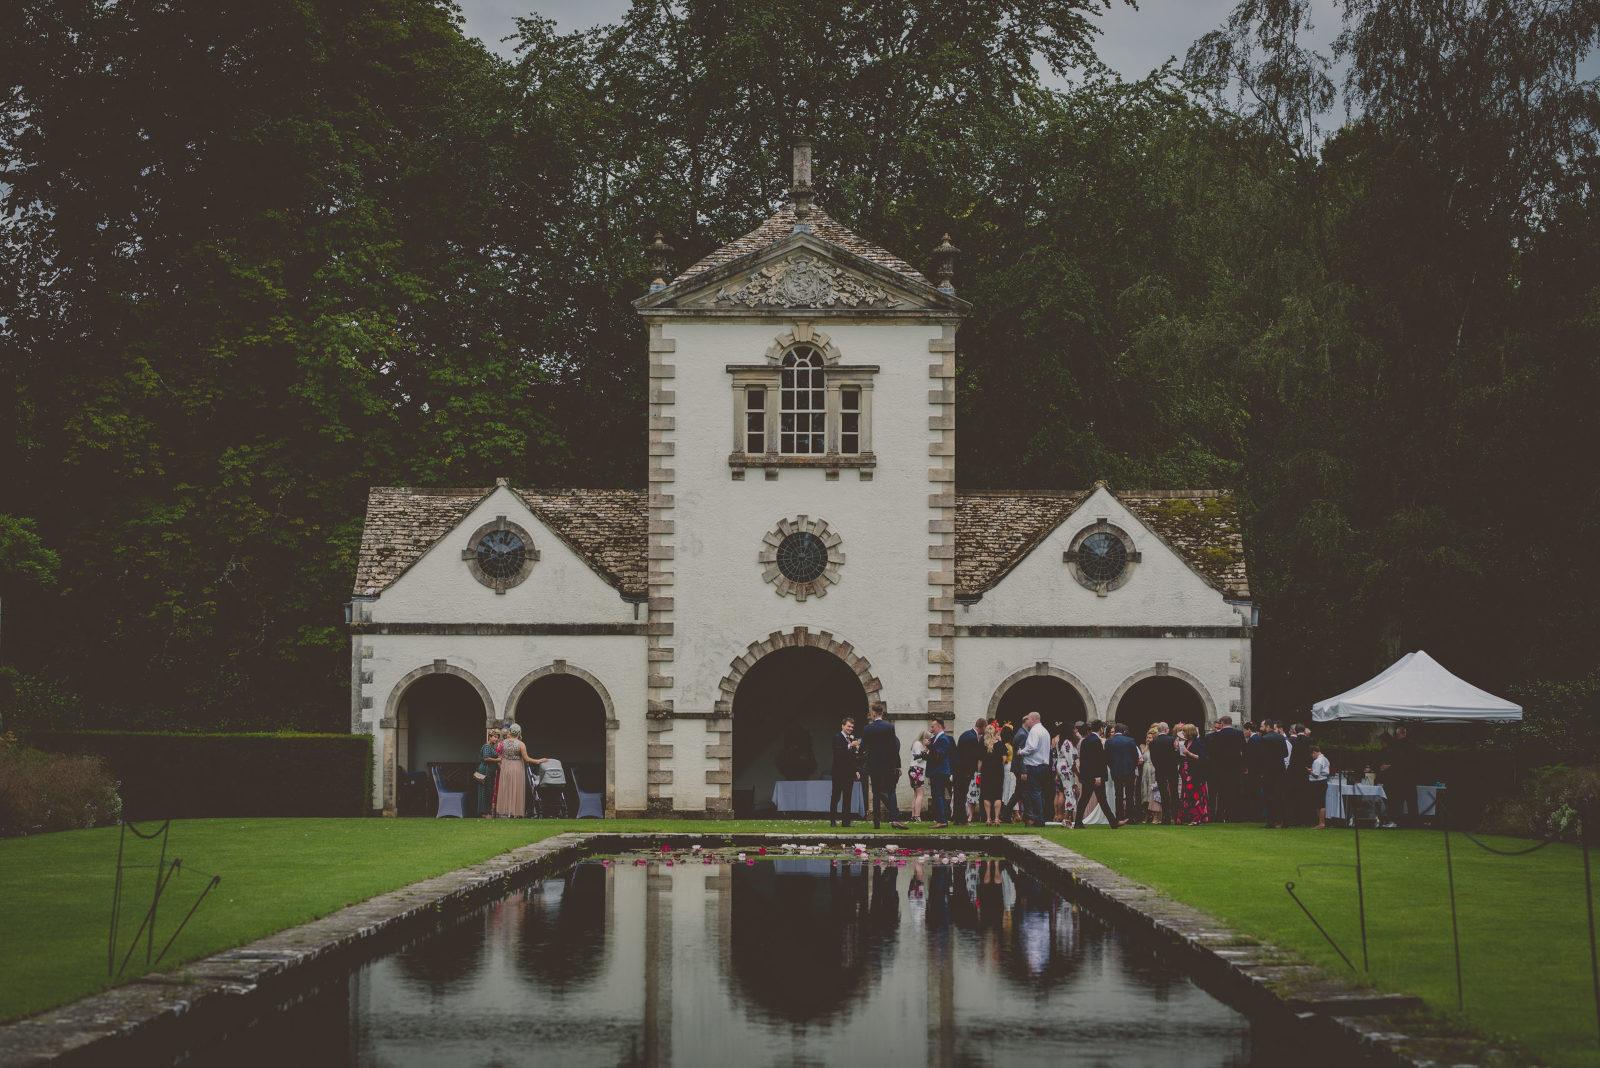 bodnant gardens weddings